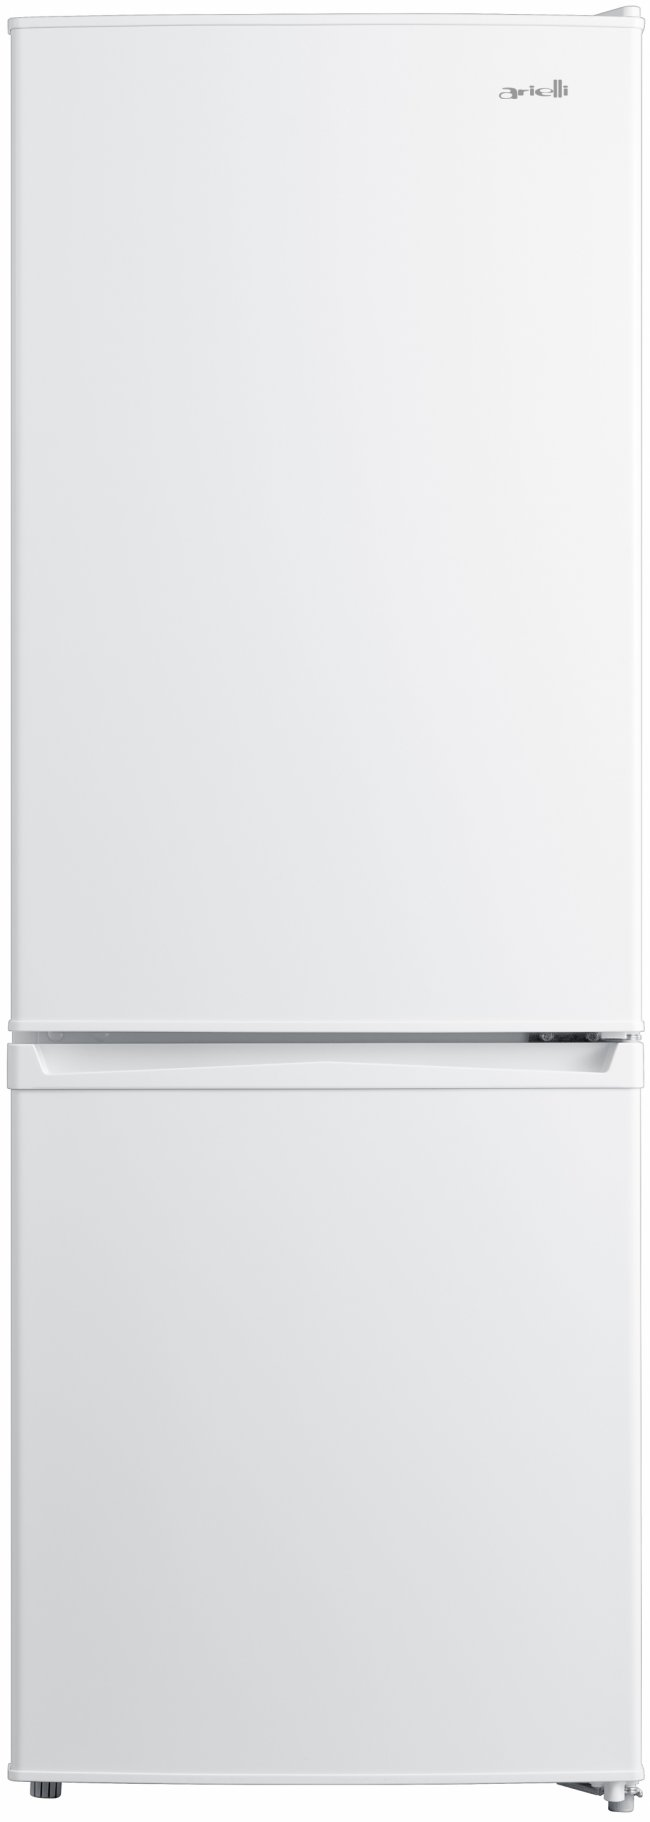 Хладилник Arielli ARD-221RN